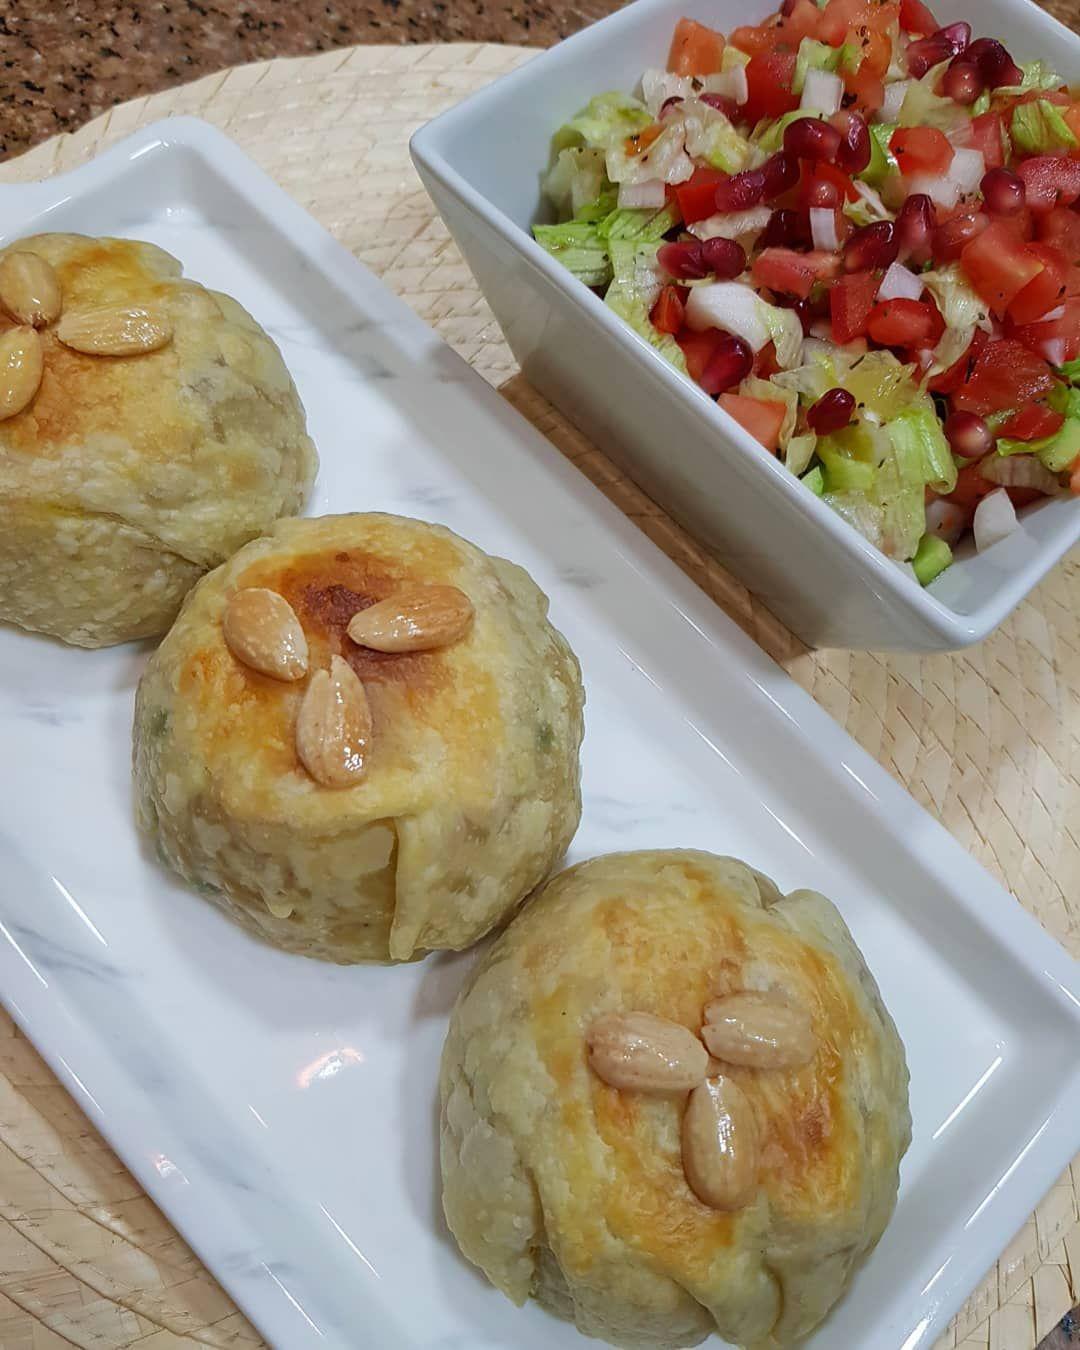 125cd8001 [New] The 10 Best Recipes (with Pictures) - Ouzi صرر الاوزي بالباف بيستري  على طريقتي المميزة خورافييية واشي فخم على سفرة رمضان @rawa…